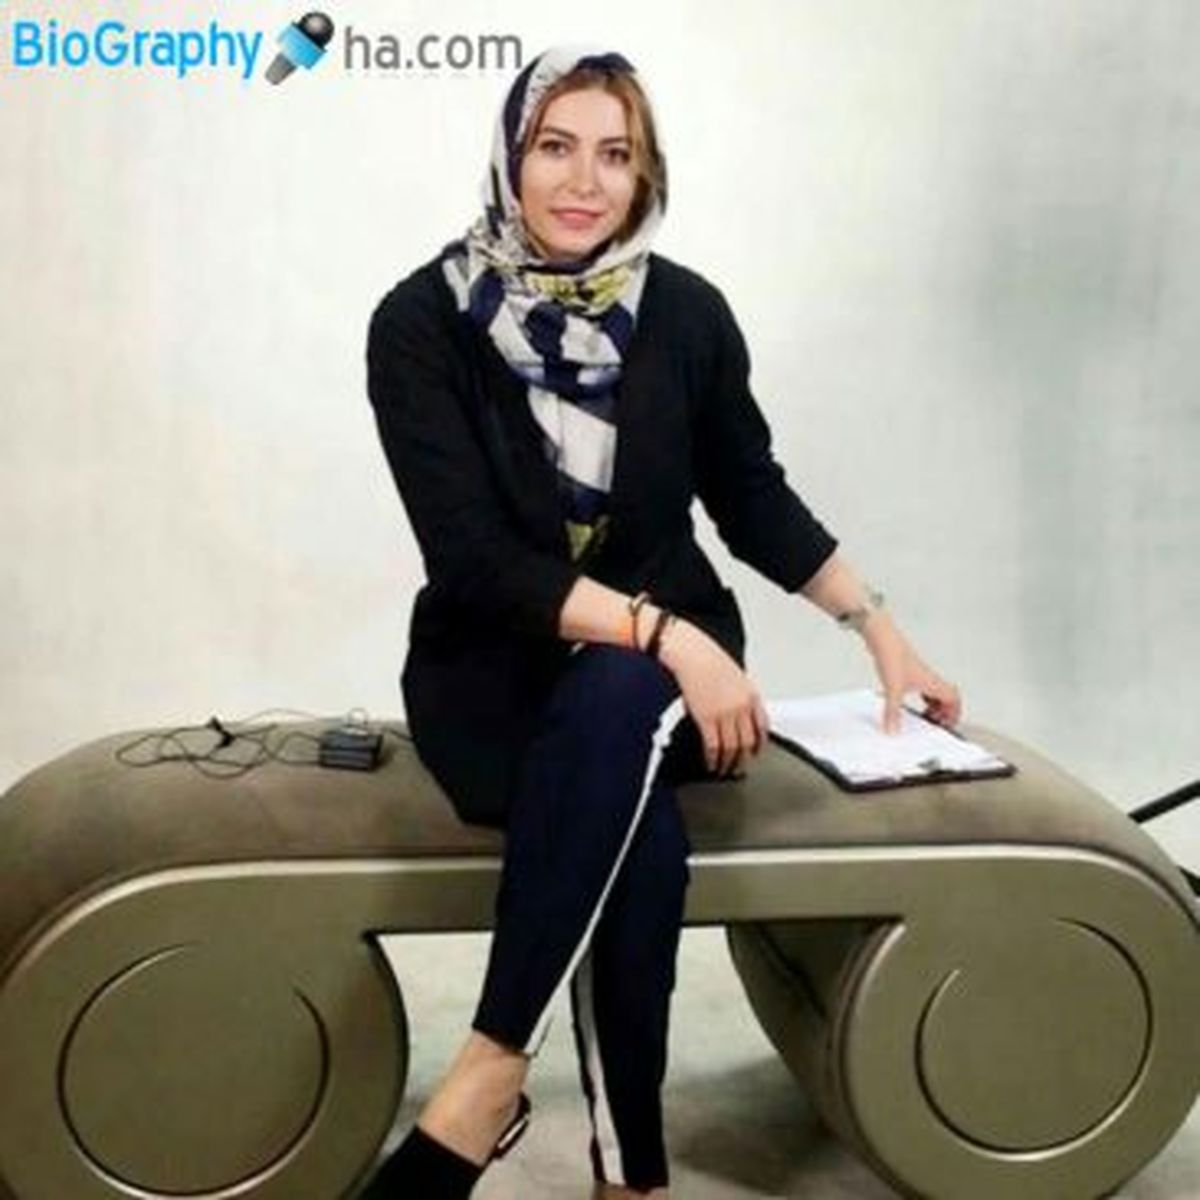 فریبا نادری   جنجال عکس لورفته از ماشین میلیاردی و لوکسش + عکس نامتعارف